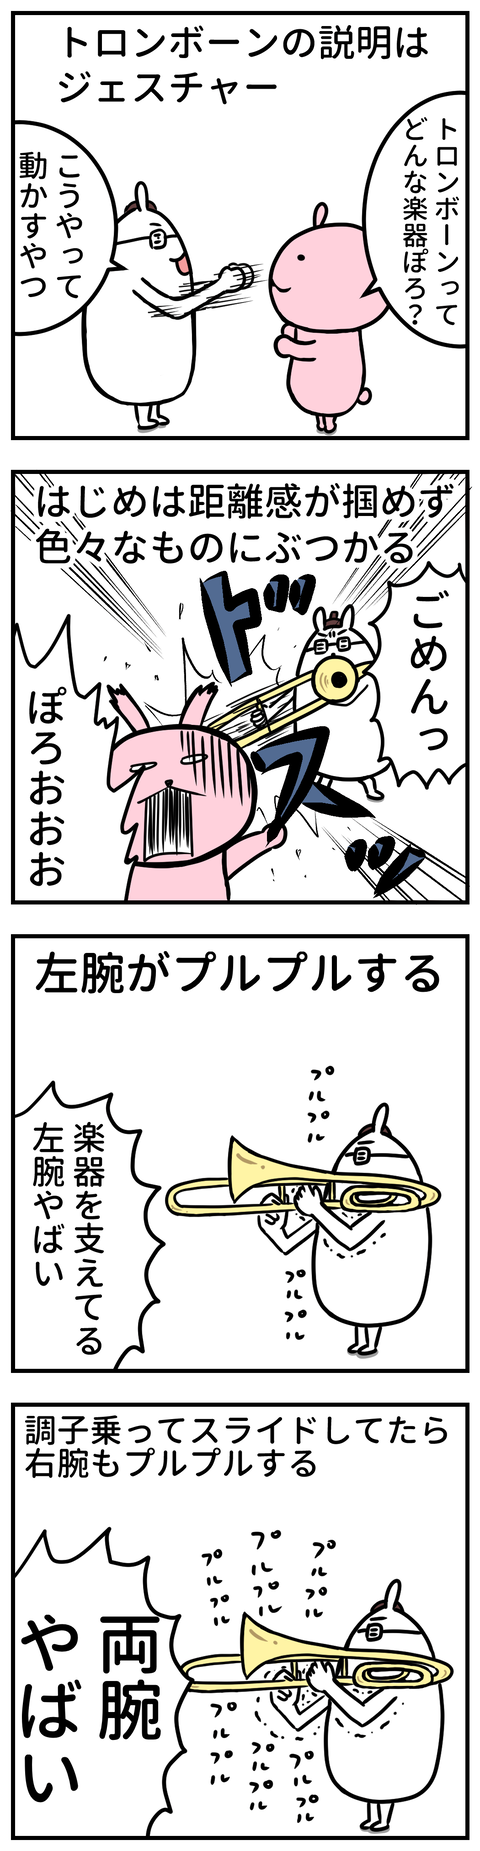 manga-yuzuporo83-1